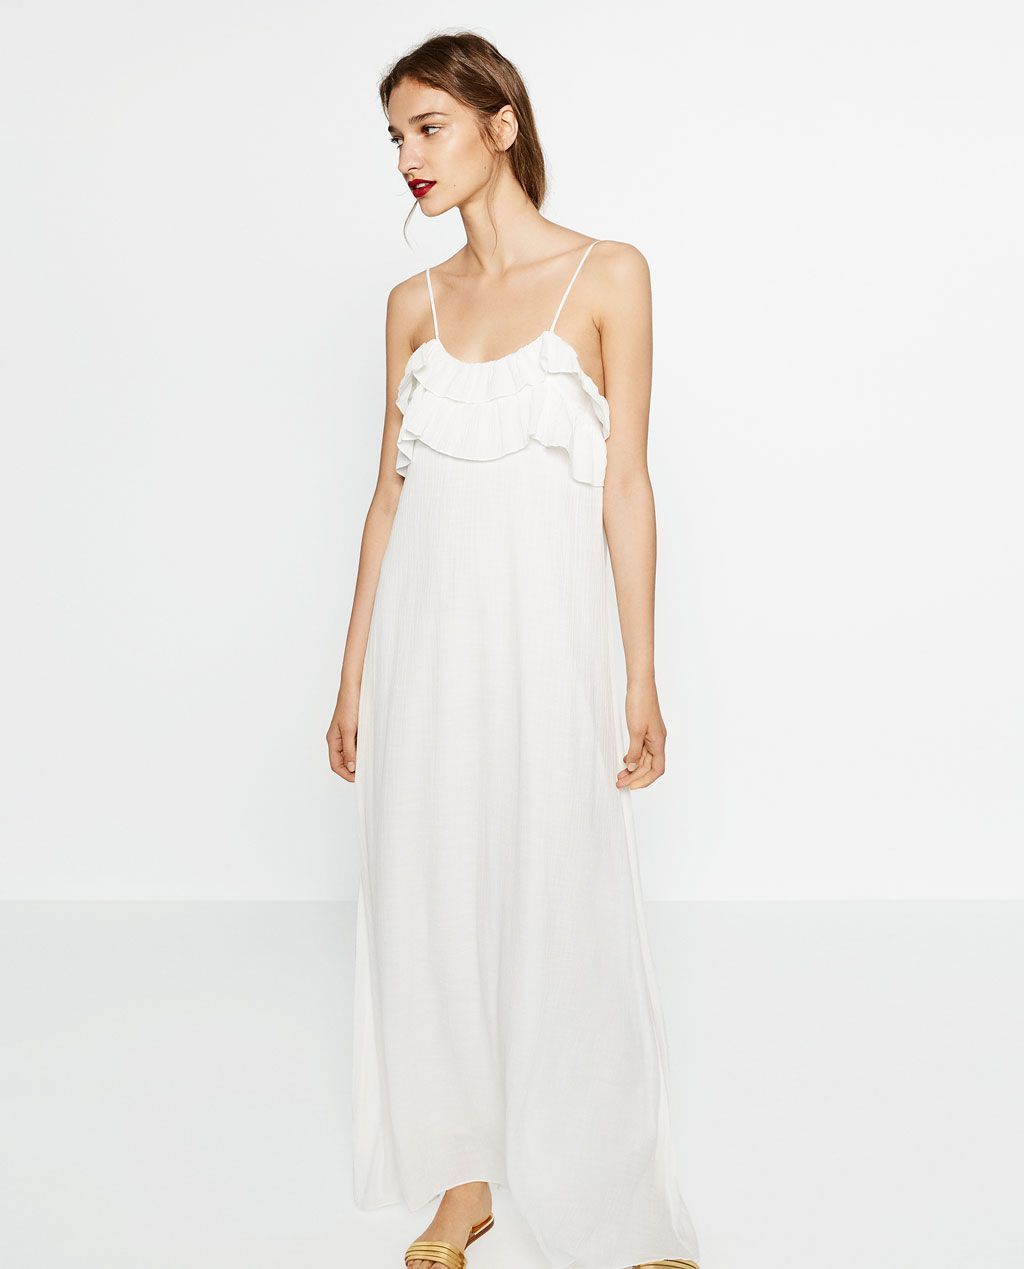 Vestidos de fiesta blanco zara